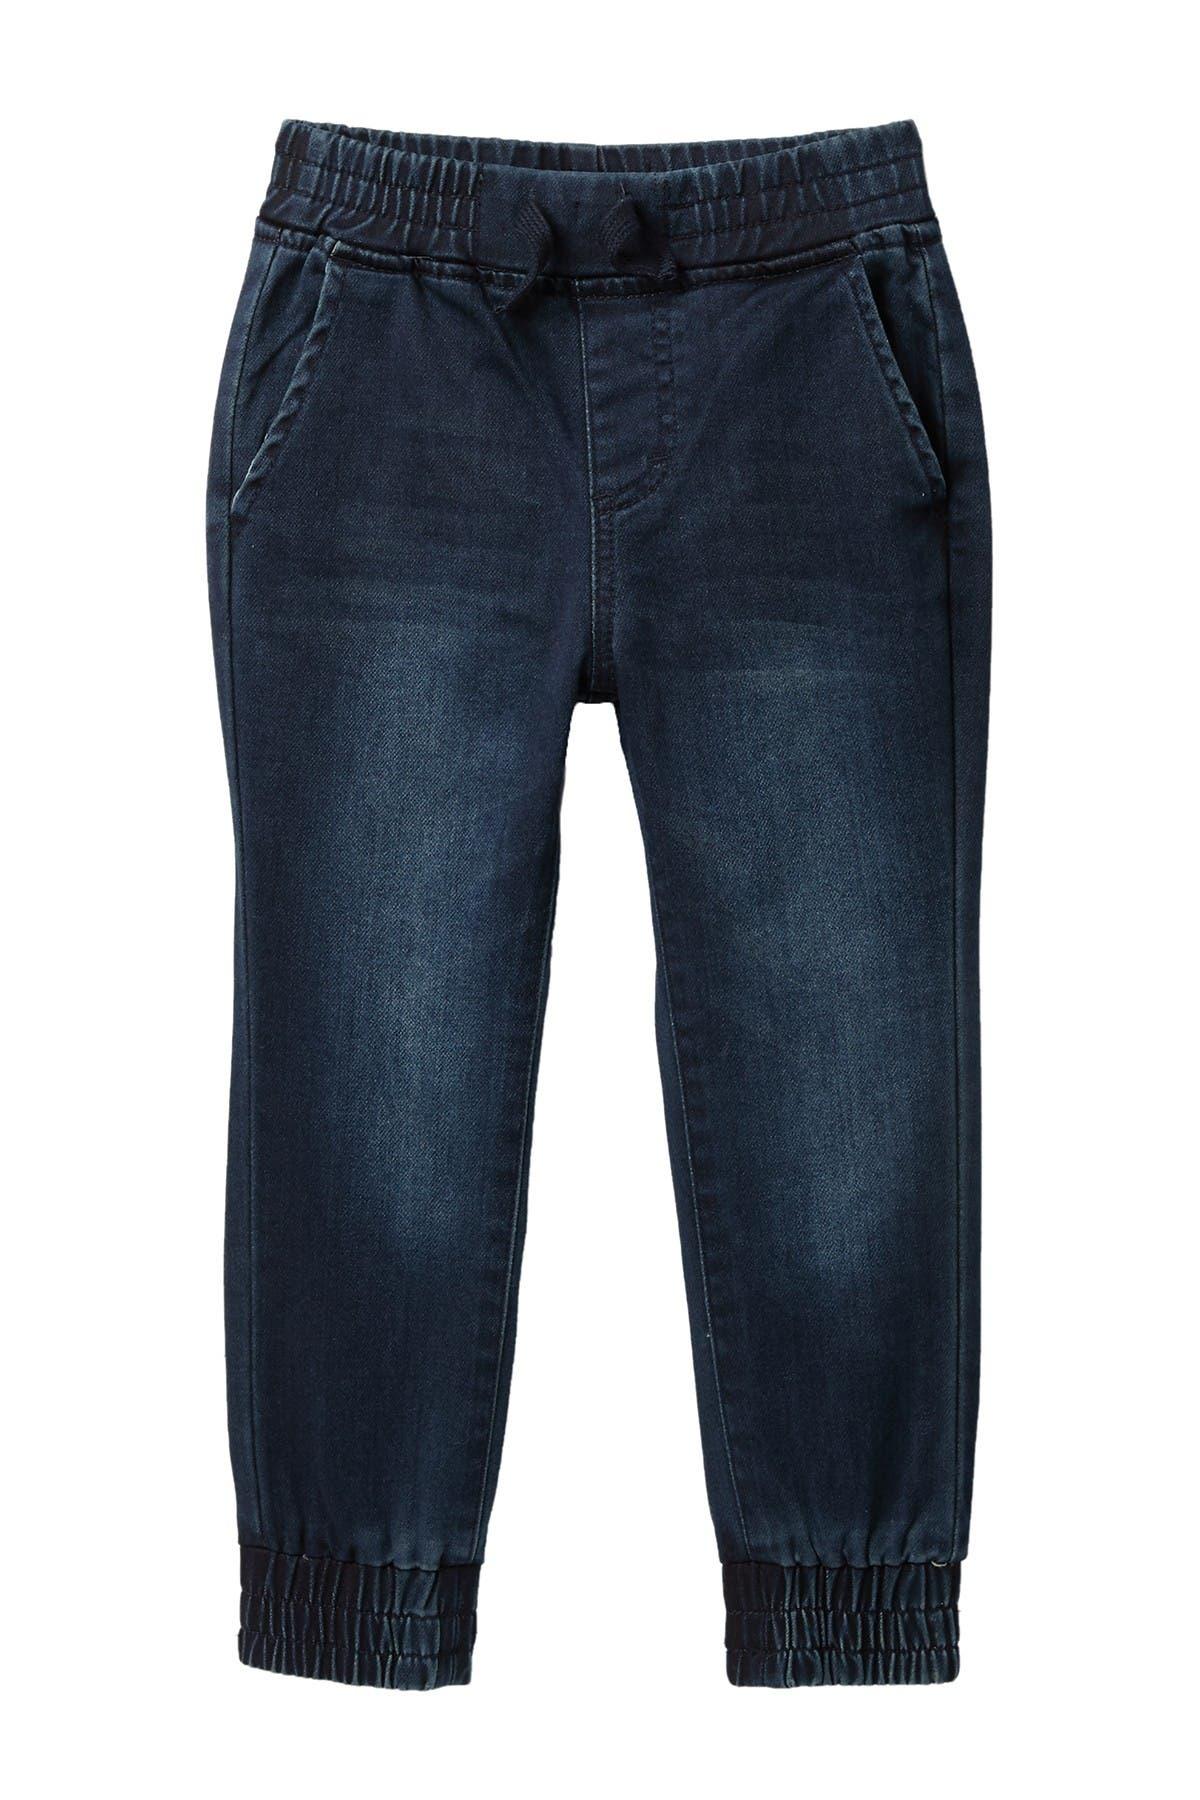 Image of Joe's Jeans Denim Knit Joggers